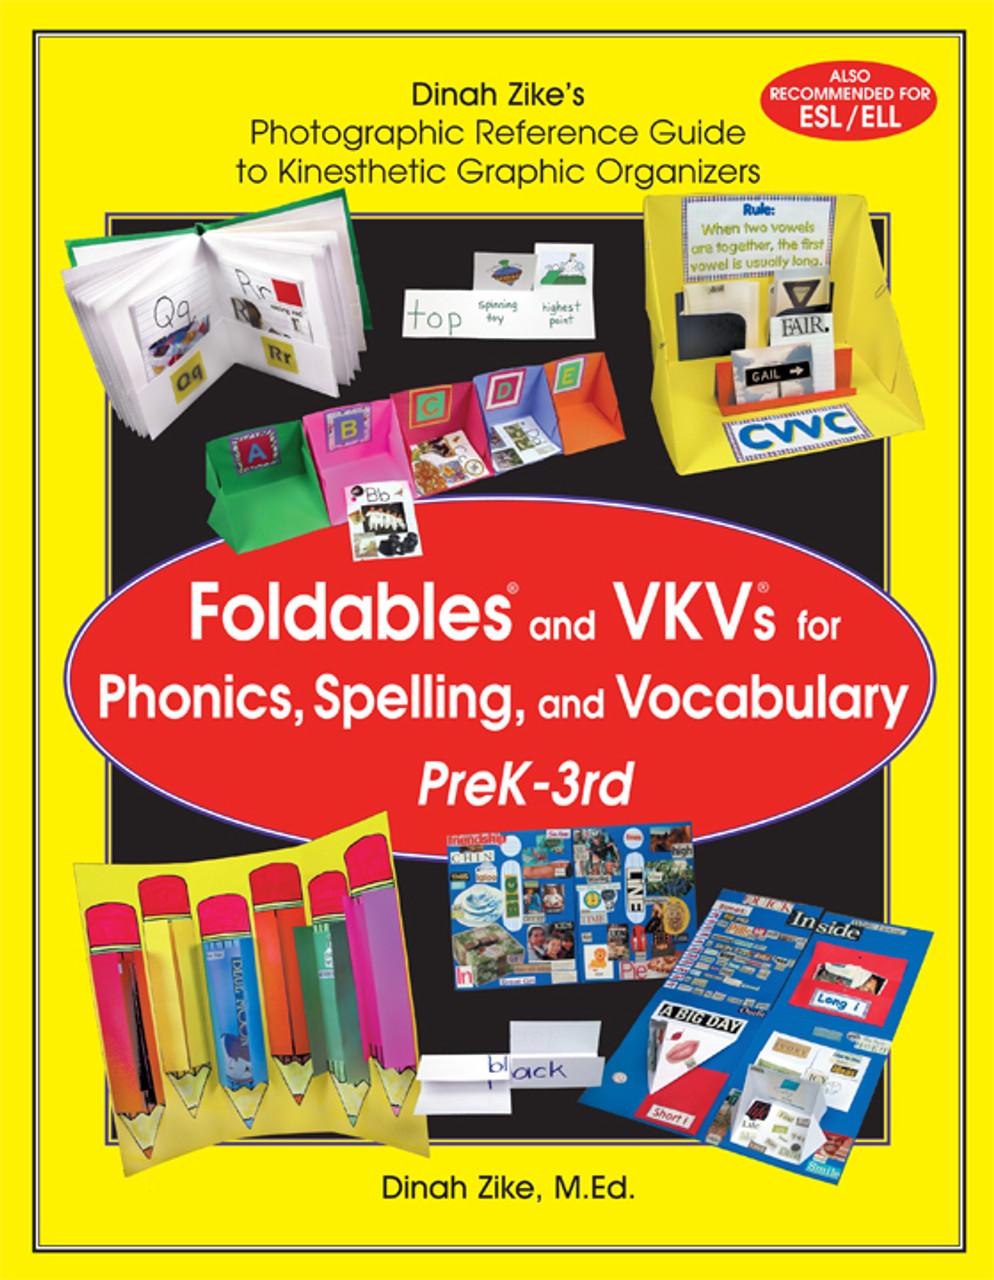 Vkv book prek-3rd